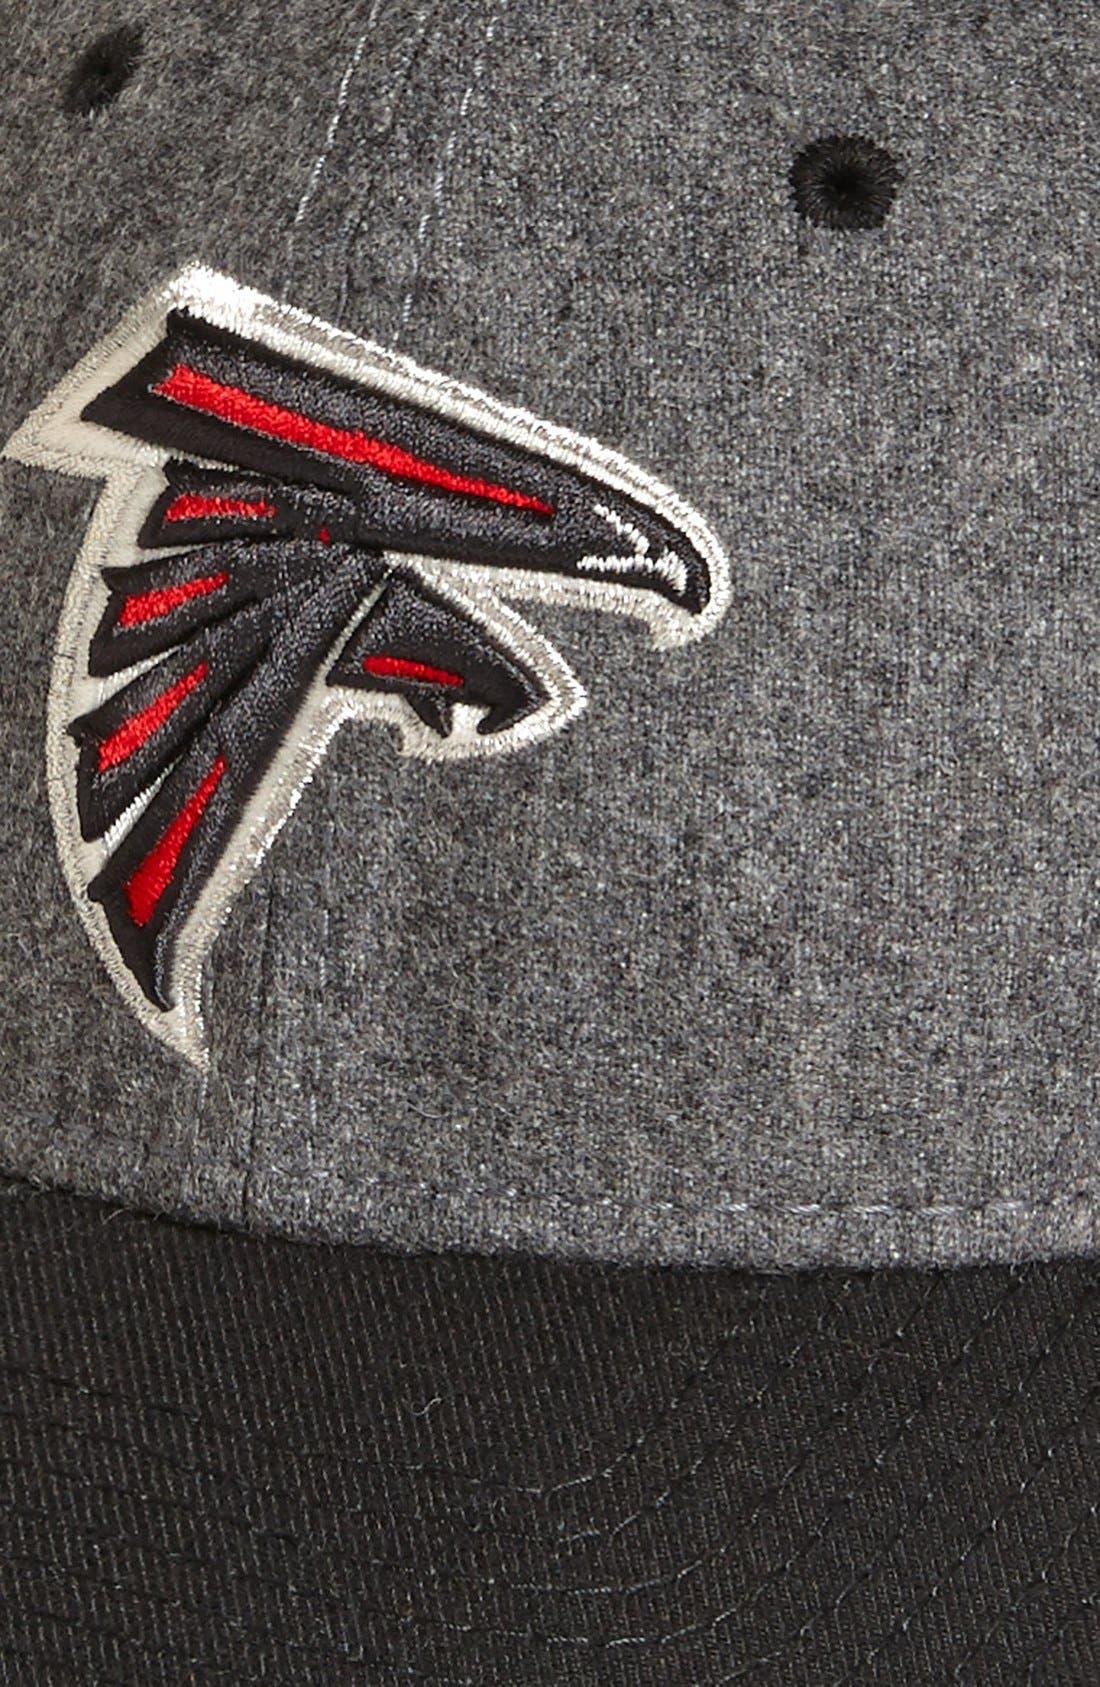 'Meltop - Atlanta Falcons' Fitted Baseball Cap,                             Alternate thumbnail 3, color,                             021